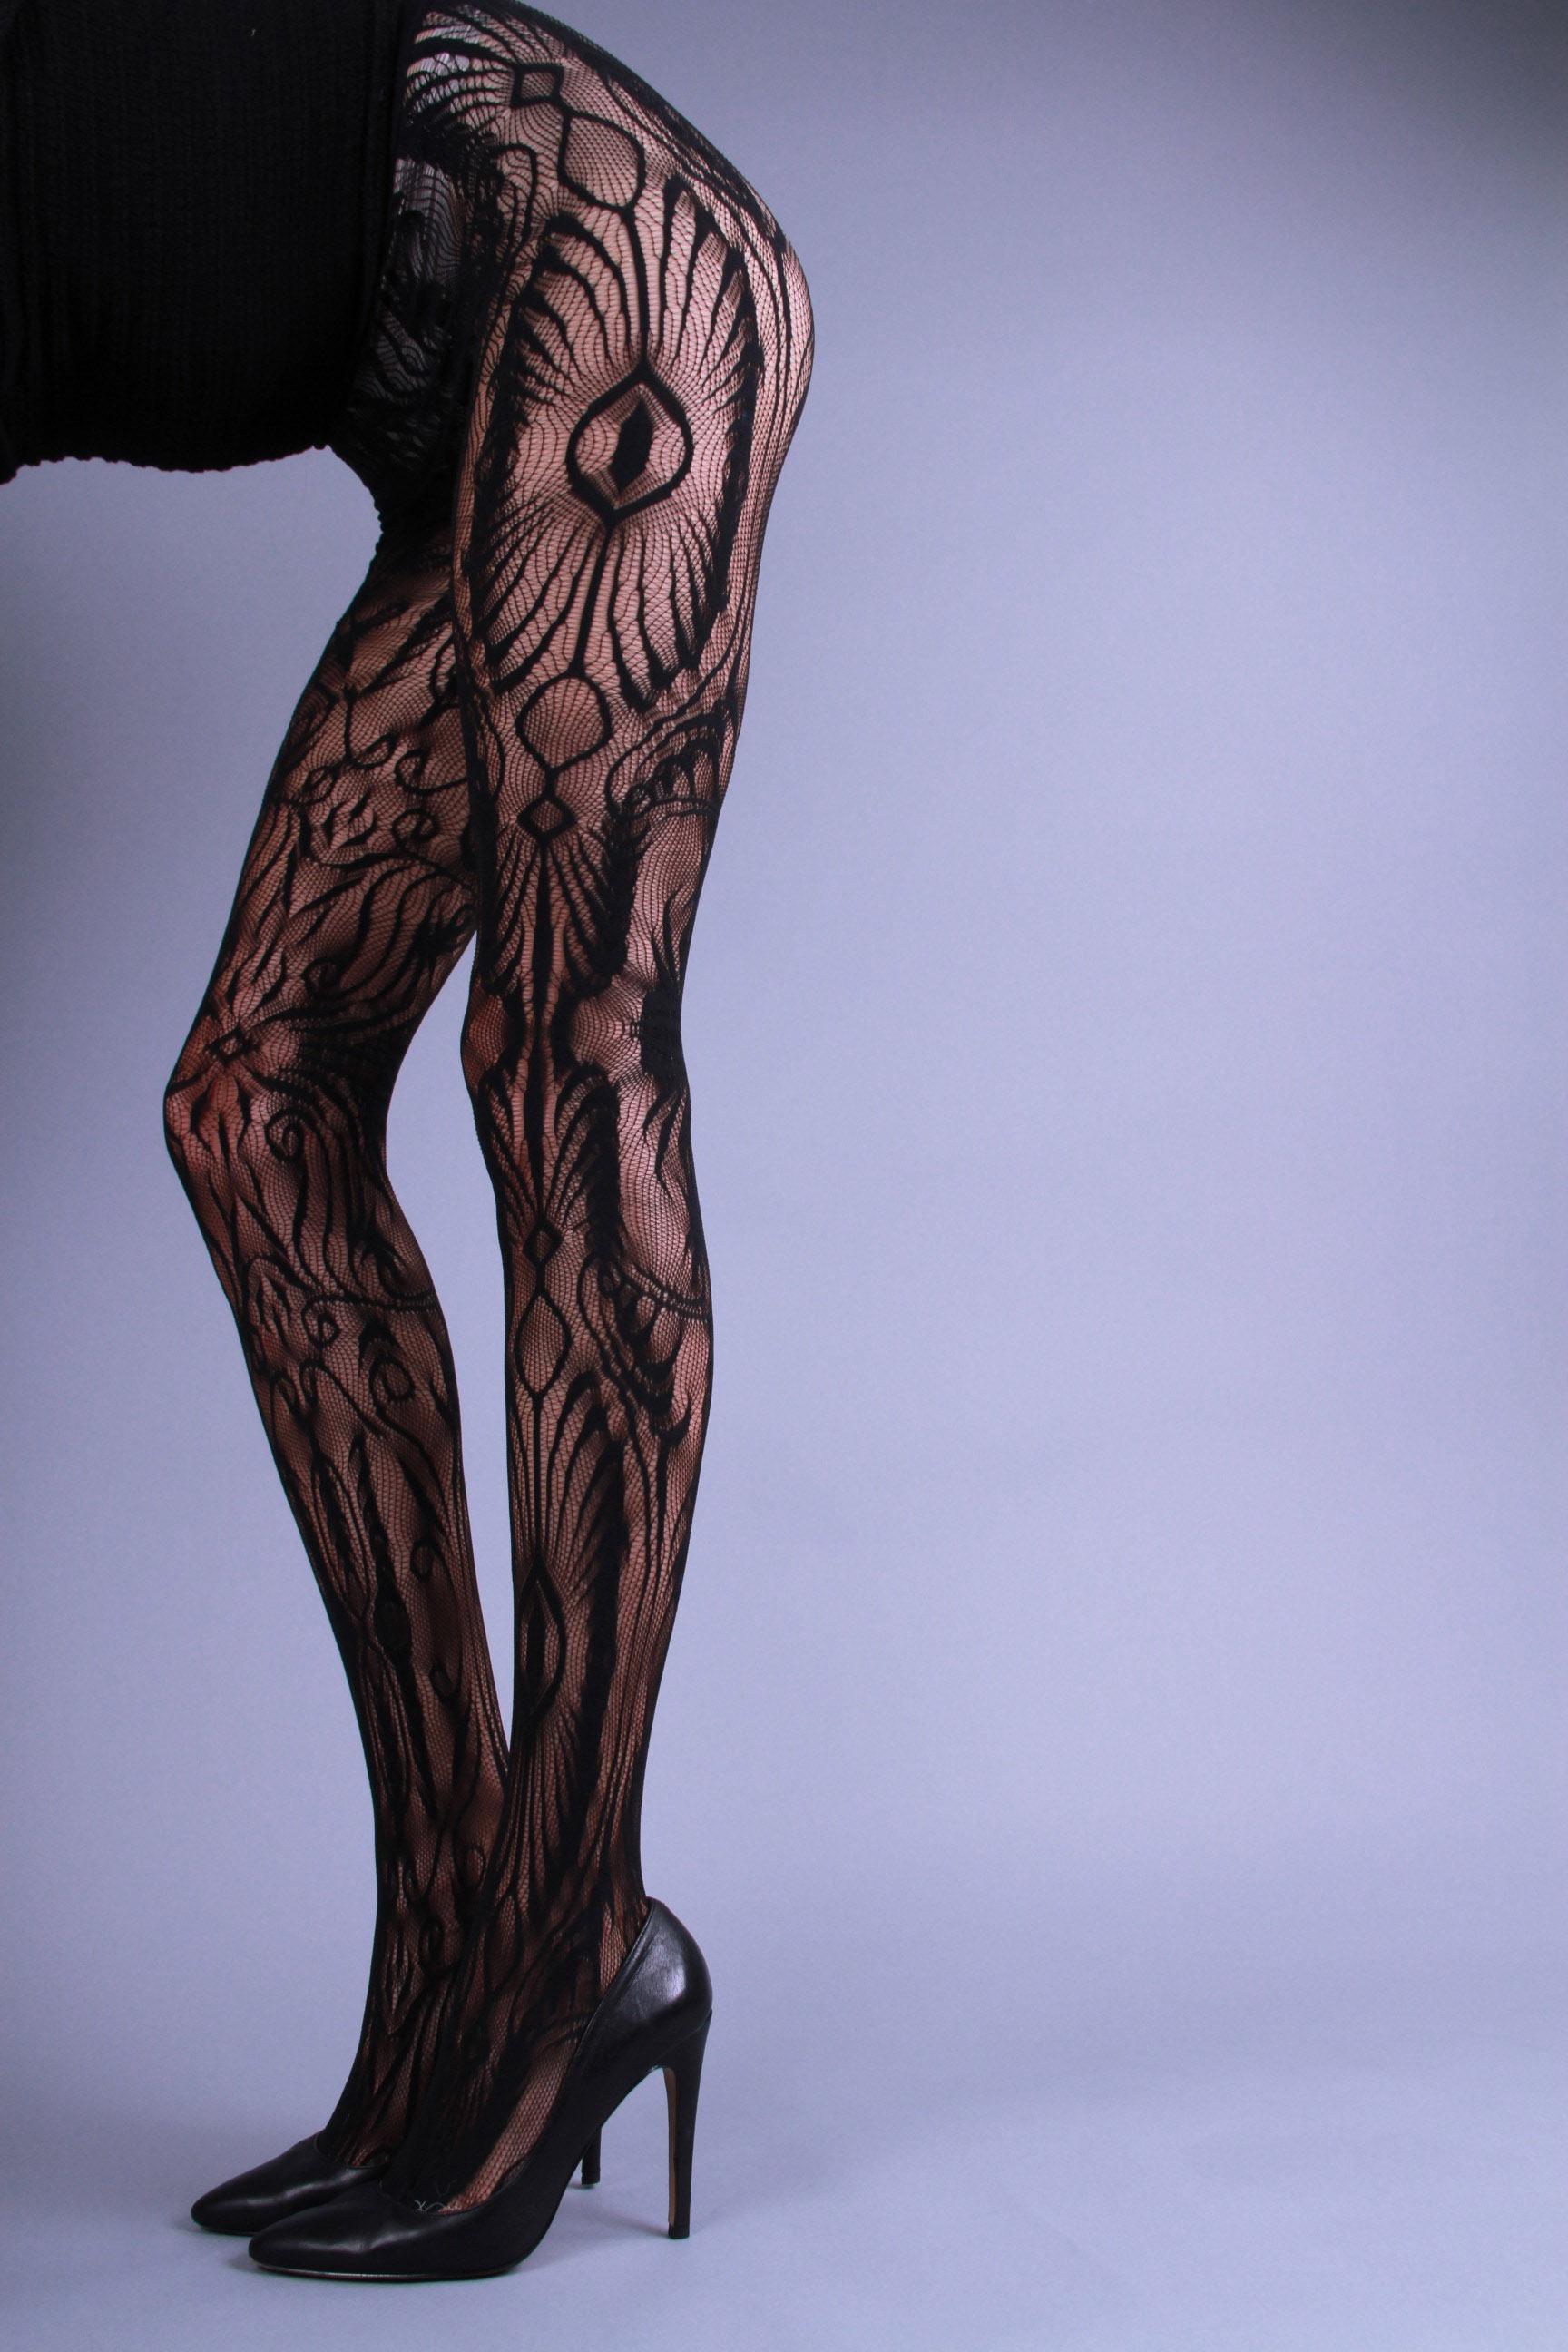 Brea Peck_Legs3